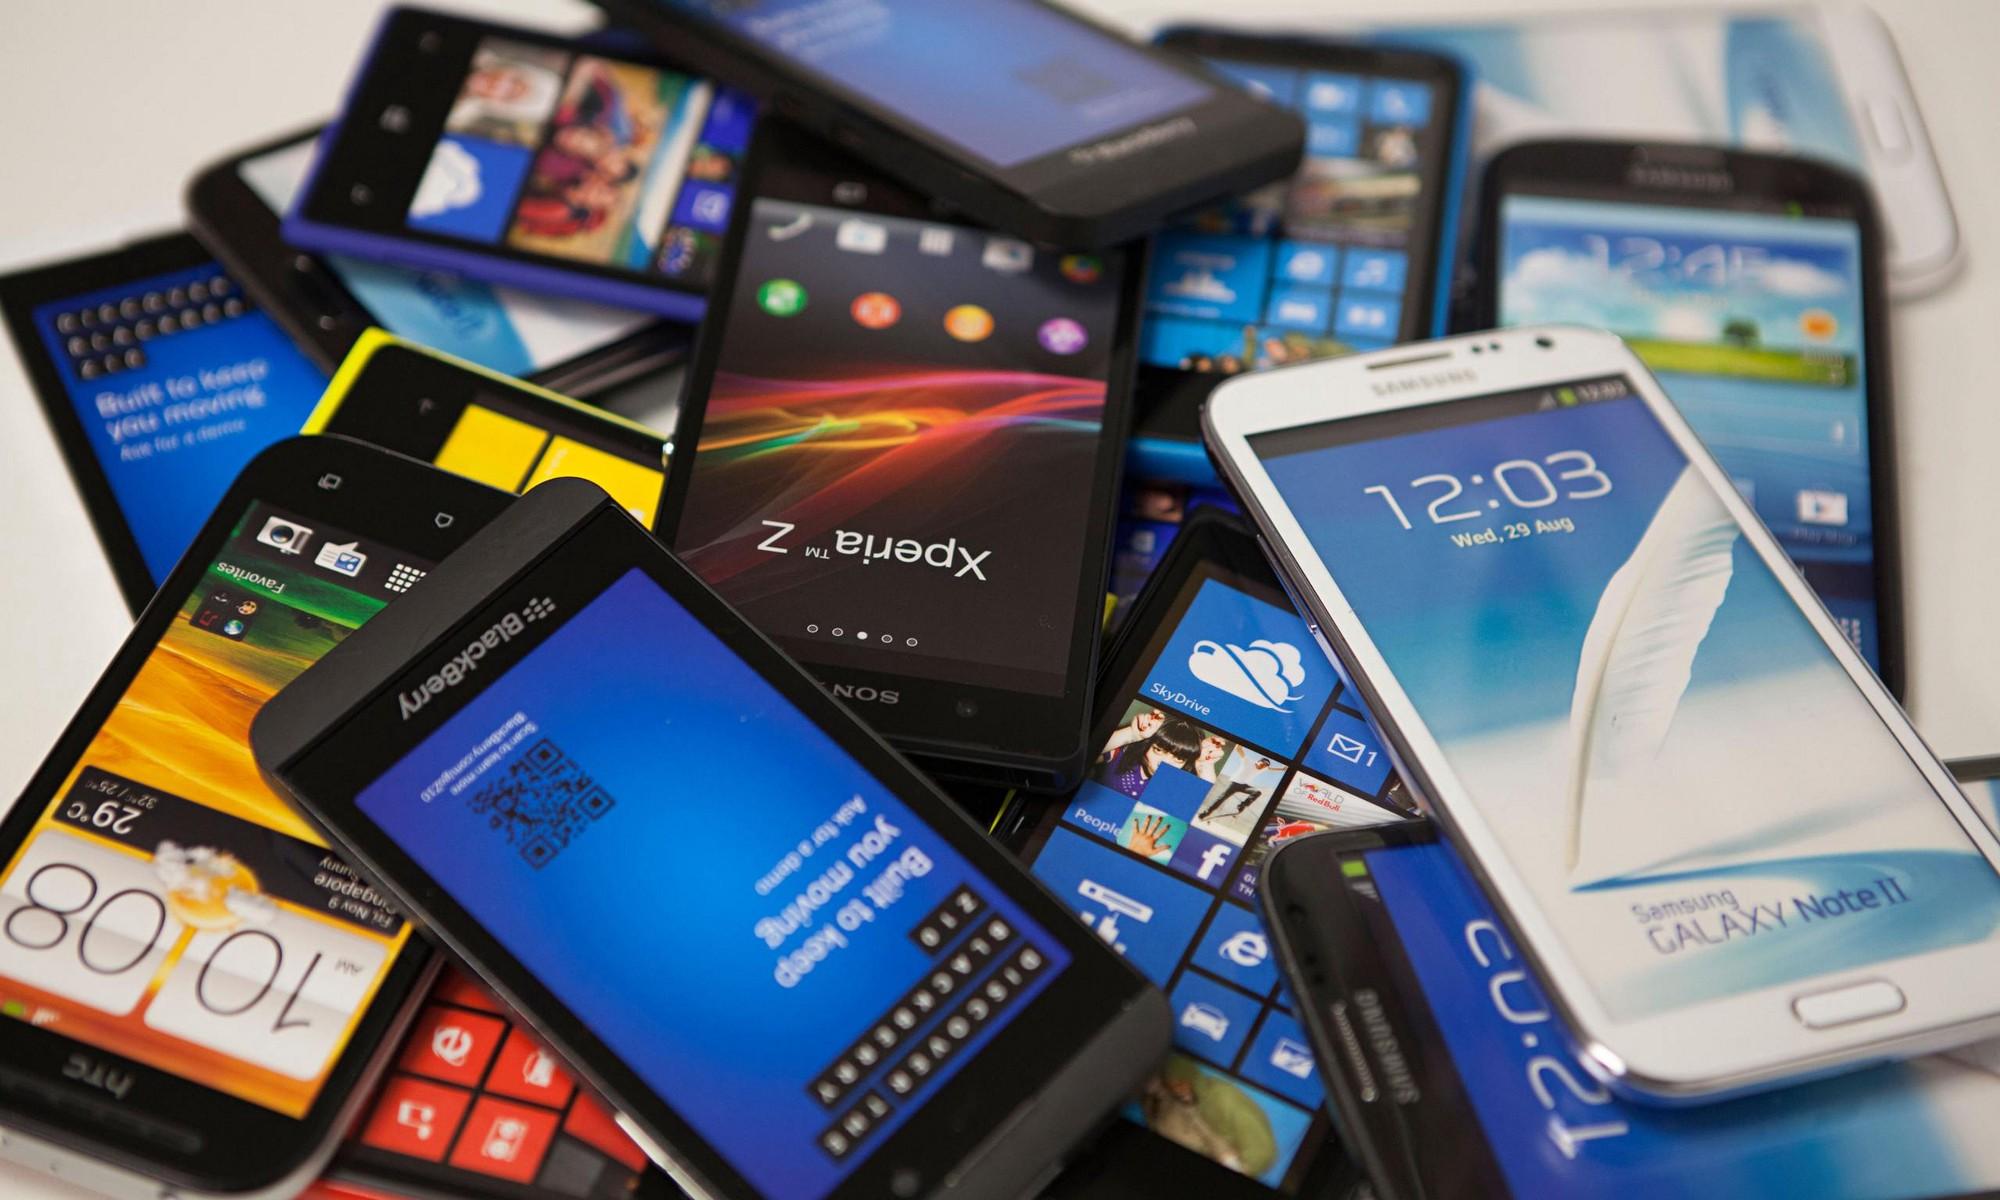 dad3bef9a38 Mercado de celulares no Brasil volta a ficar positivo no segundo trimestre